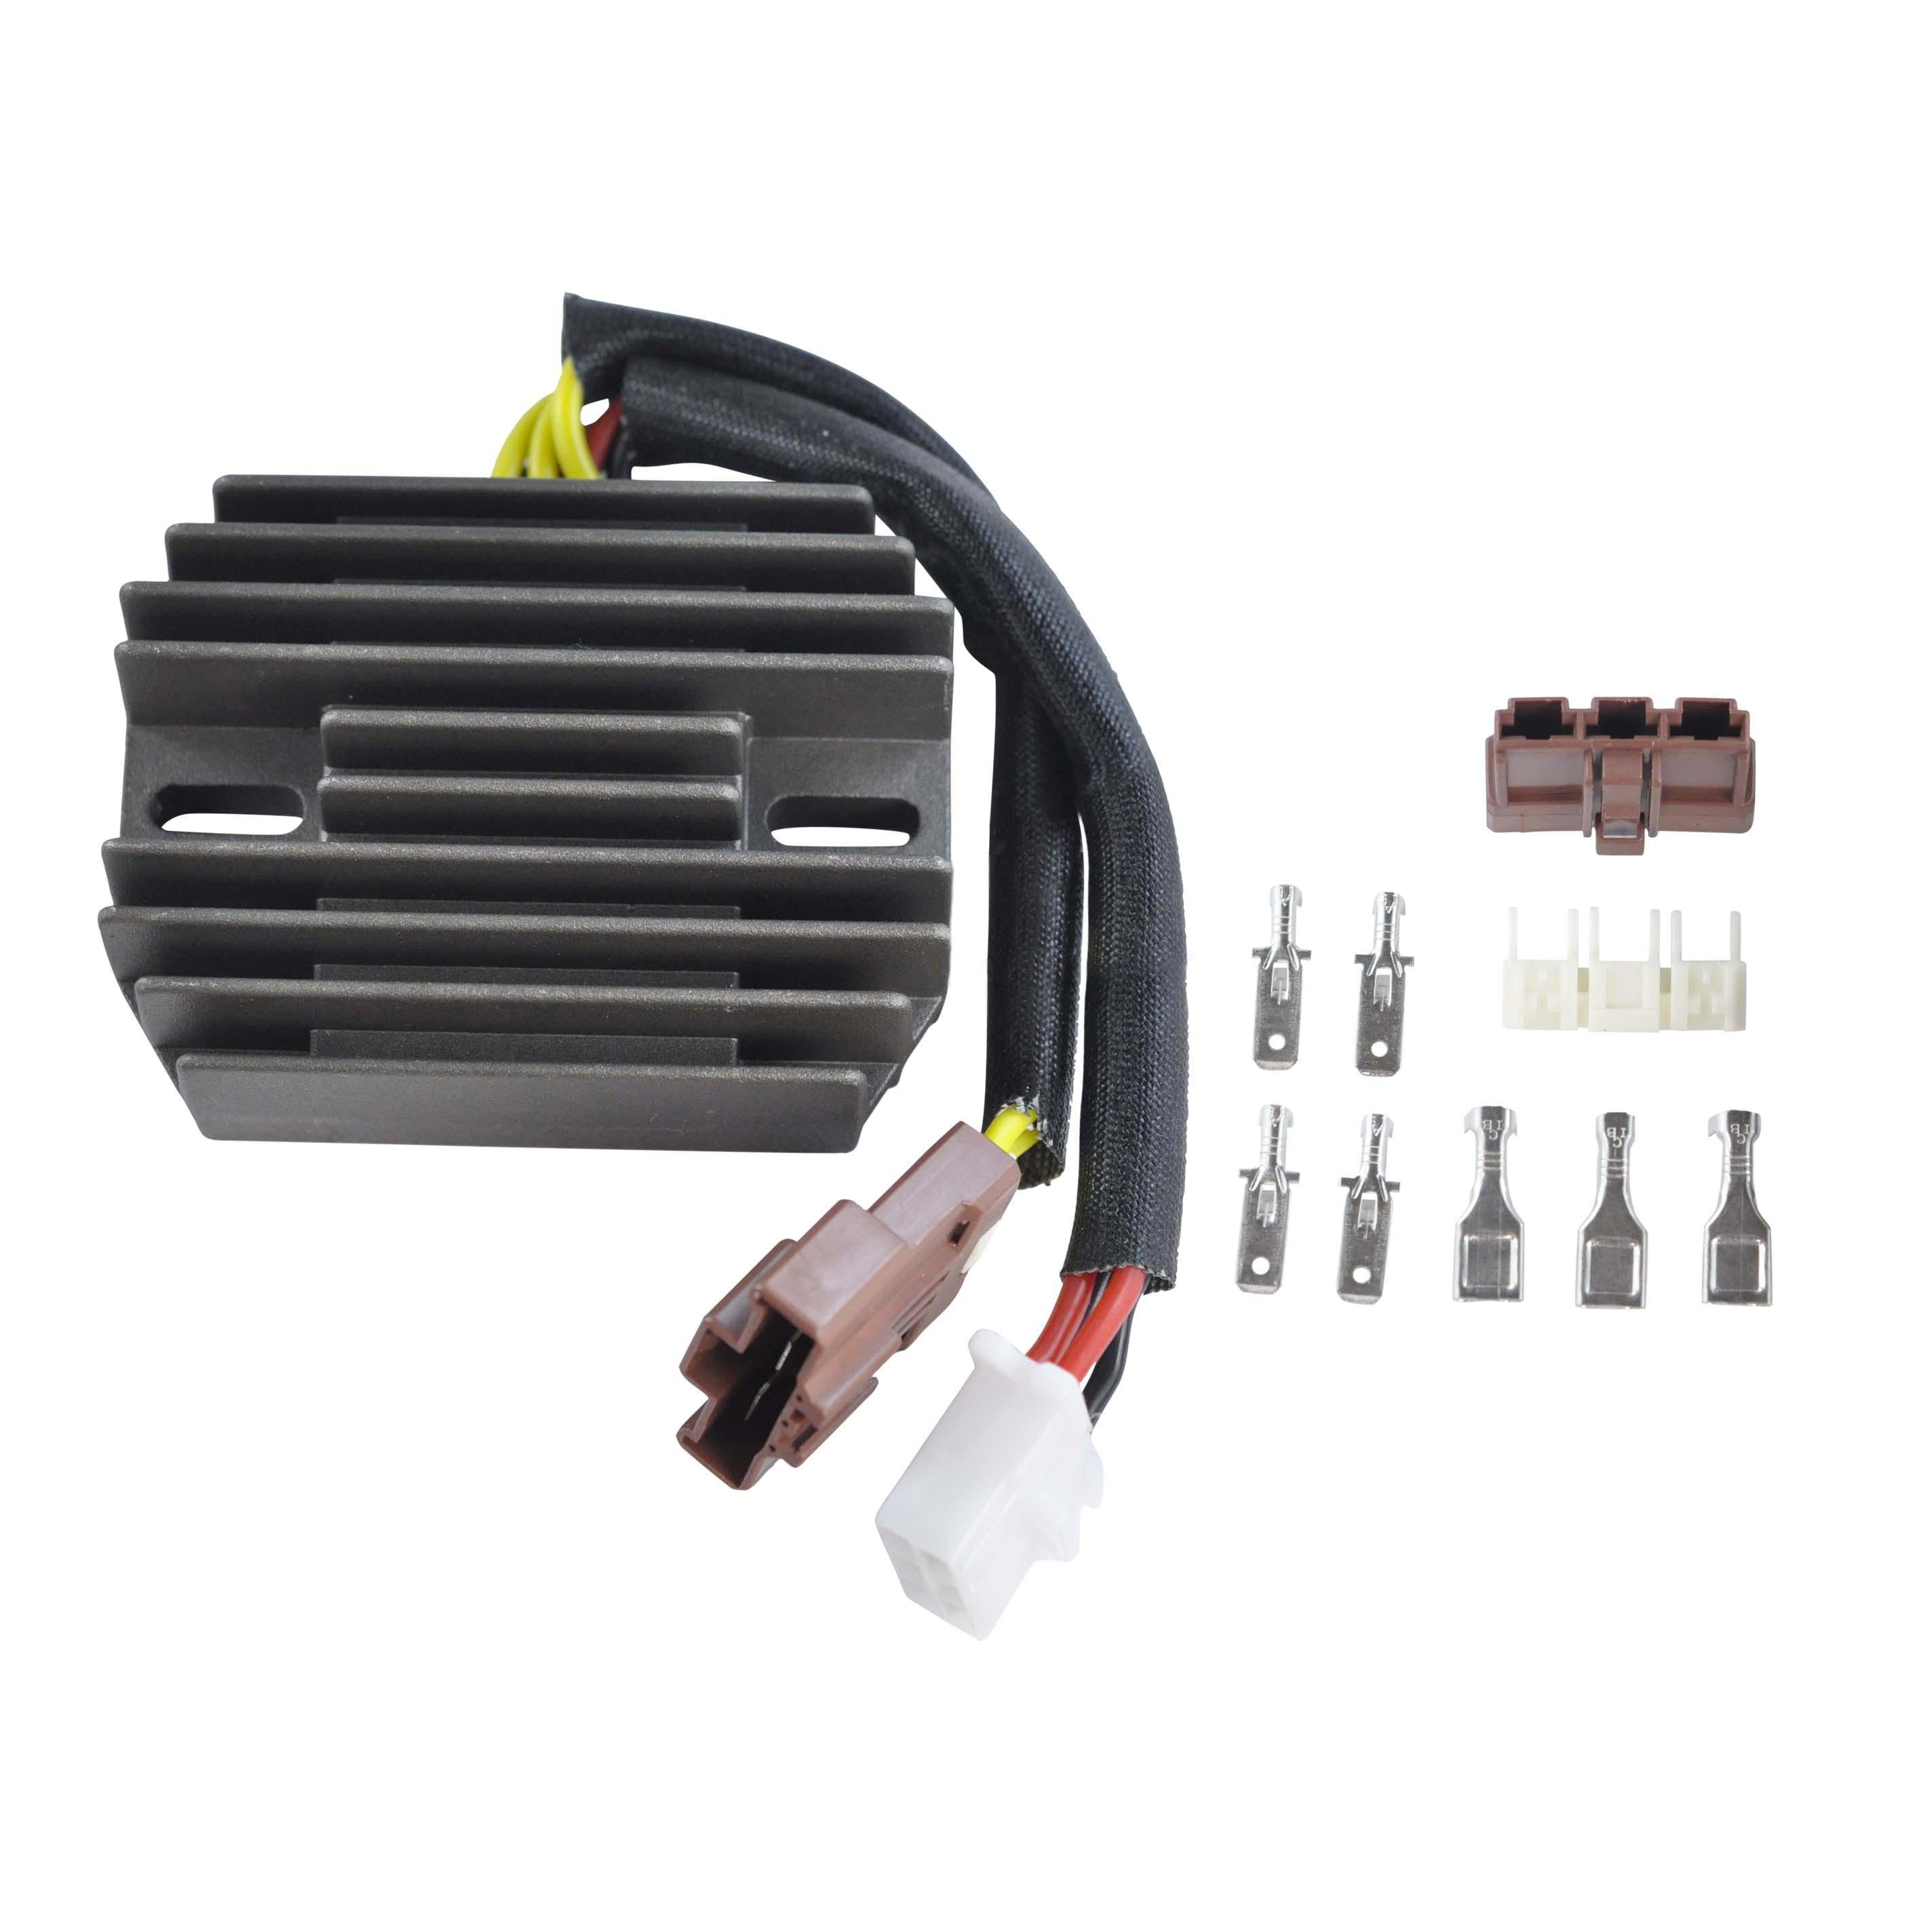 Aprillia Rsv 1000 R Regulator Rectifier Moto Electrical Baja 90cc Wiring Diagram Replaces Ap8124267